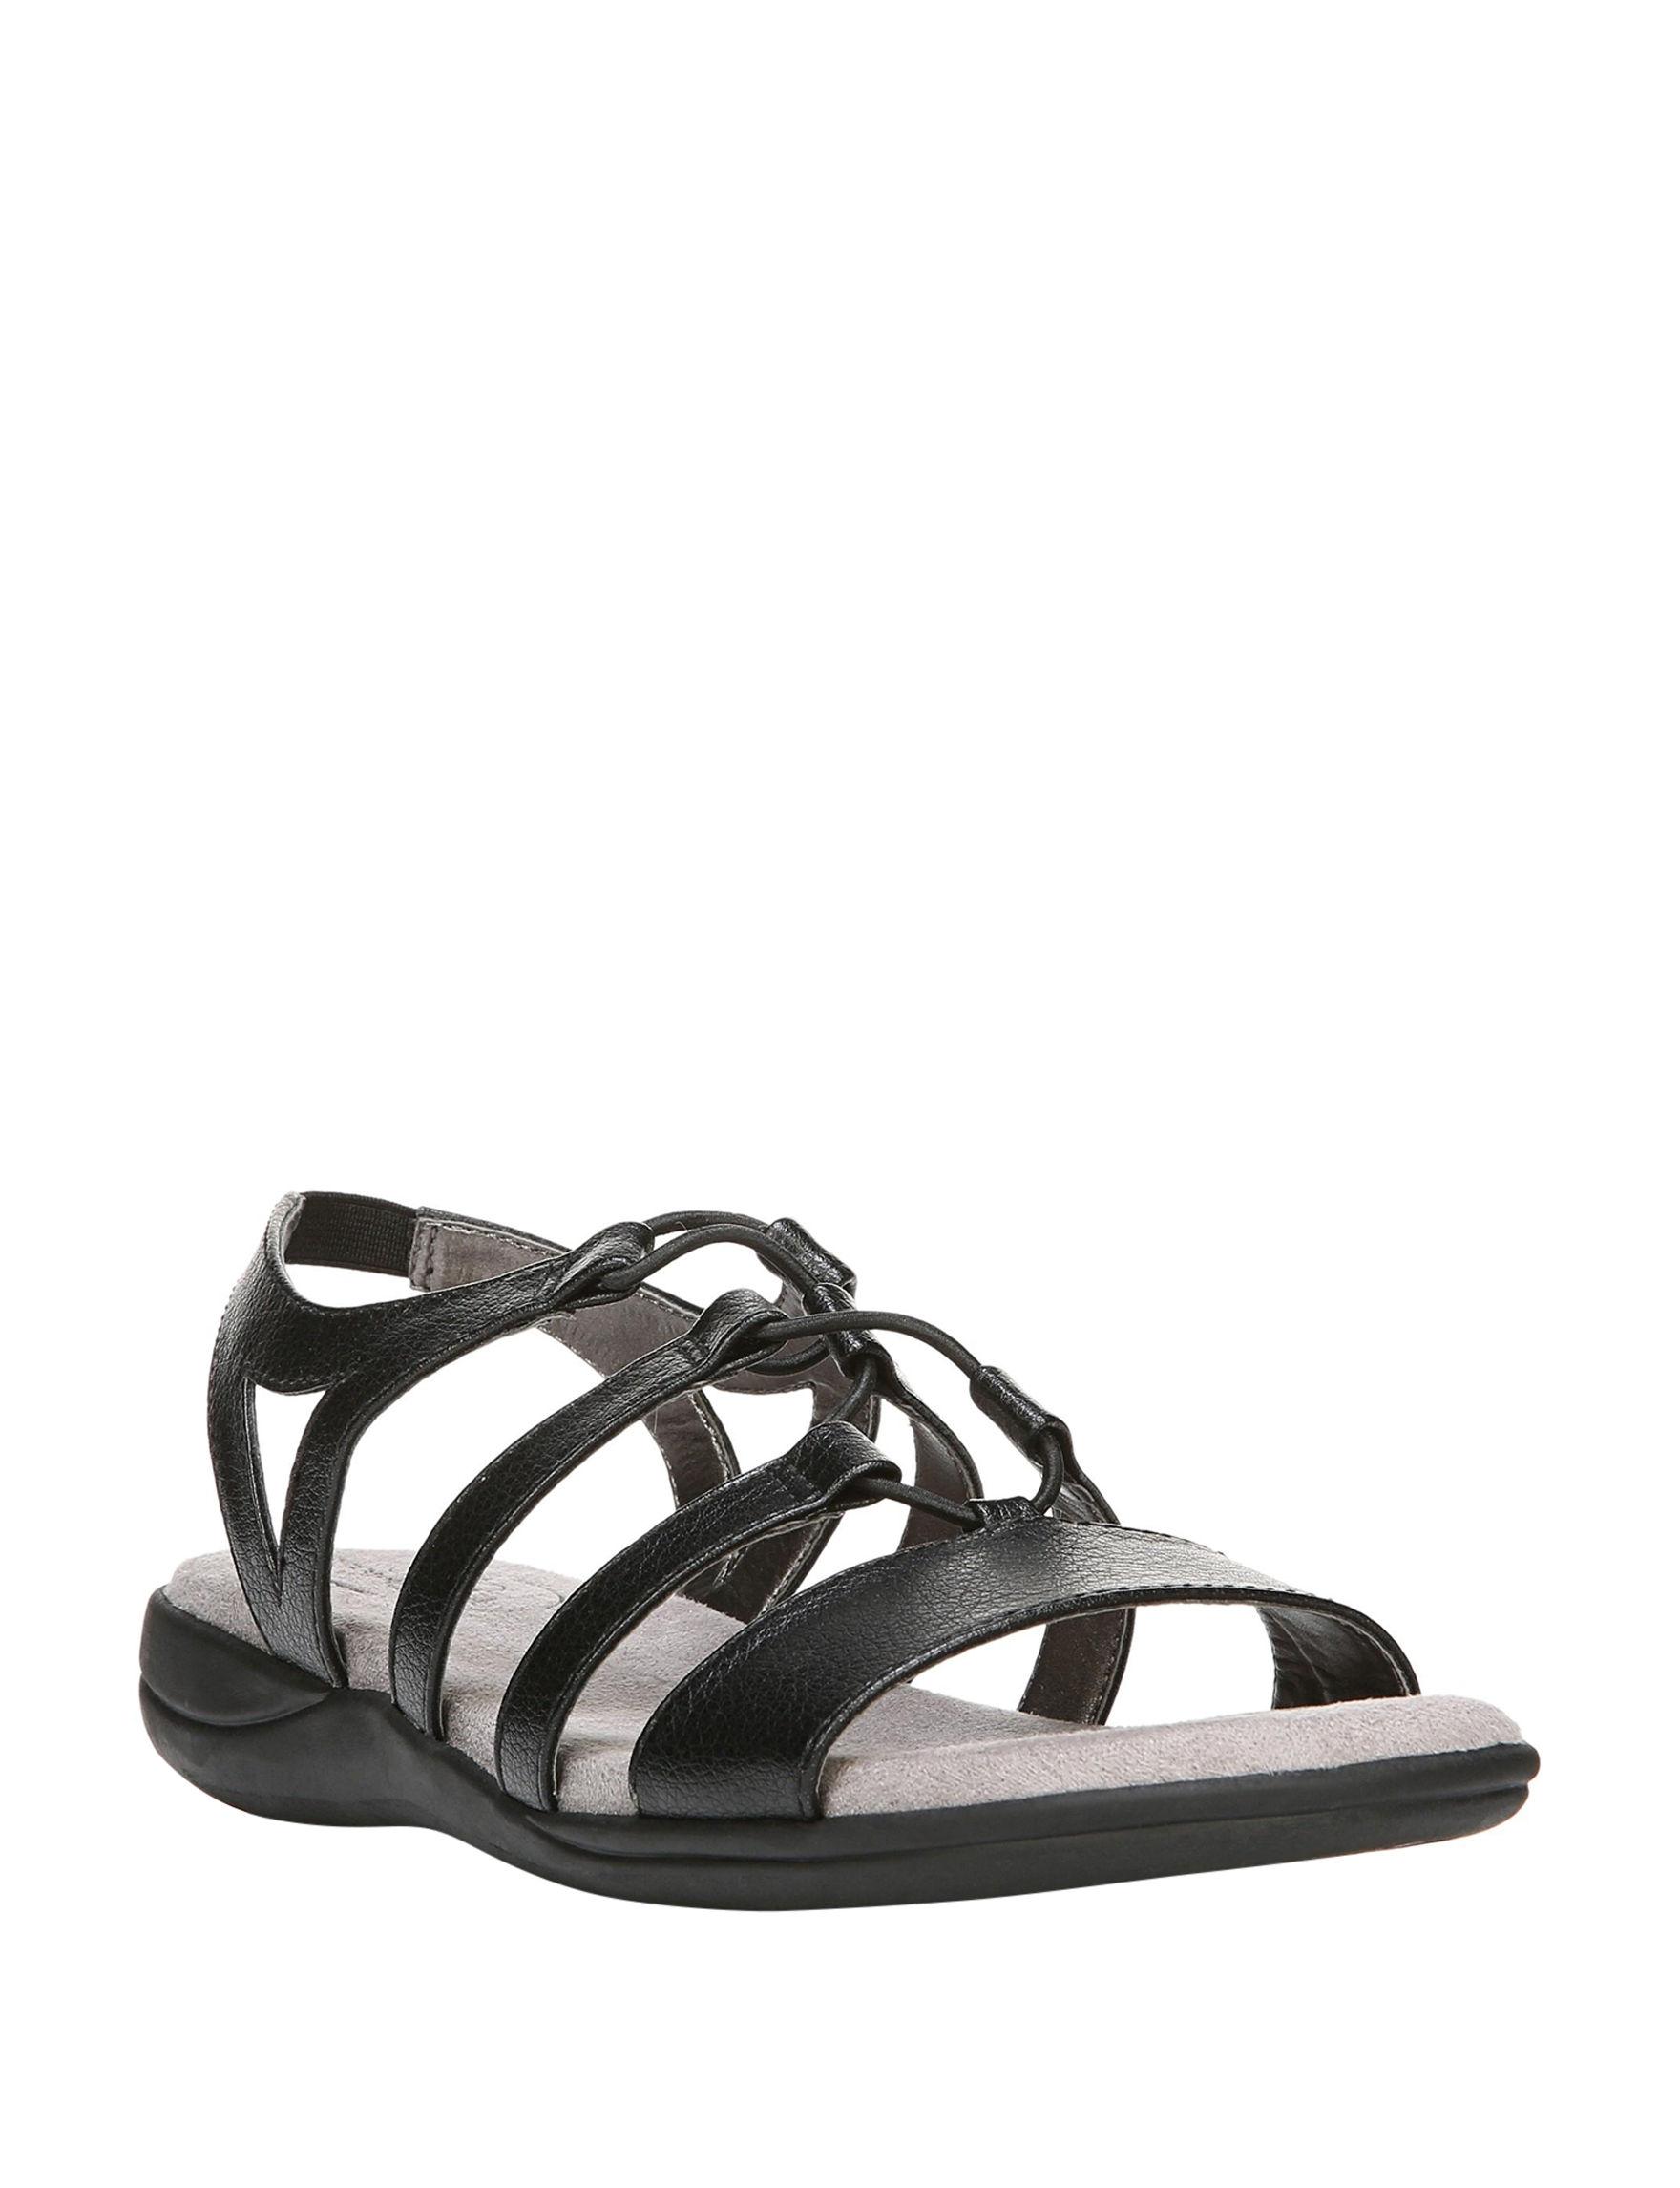 Lifestride Black Flat Sandals